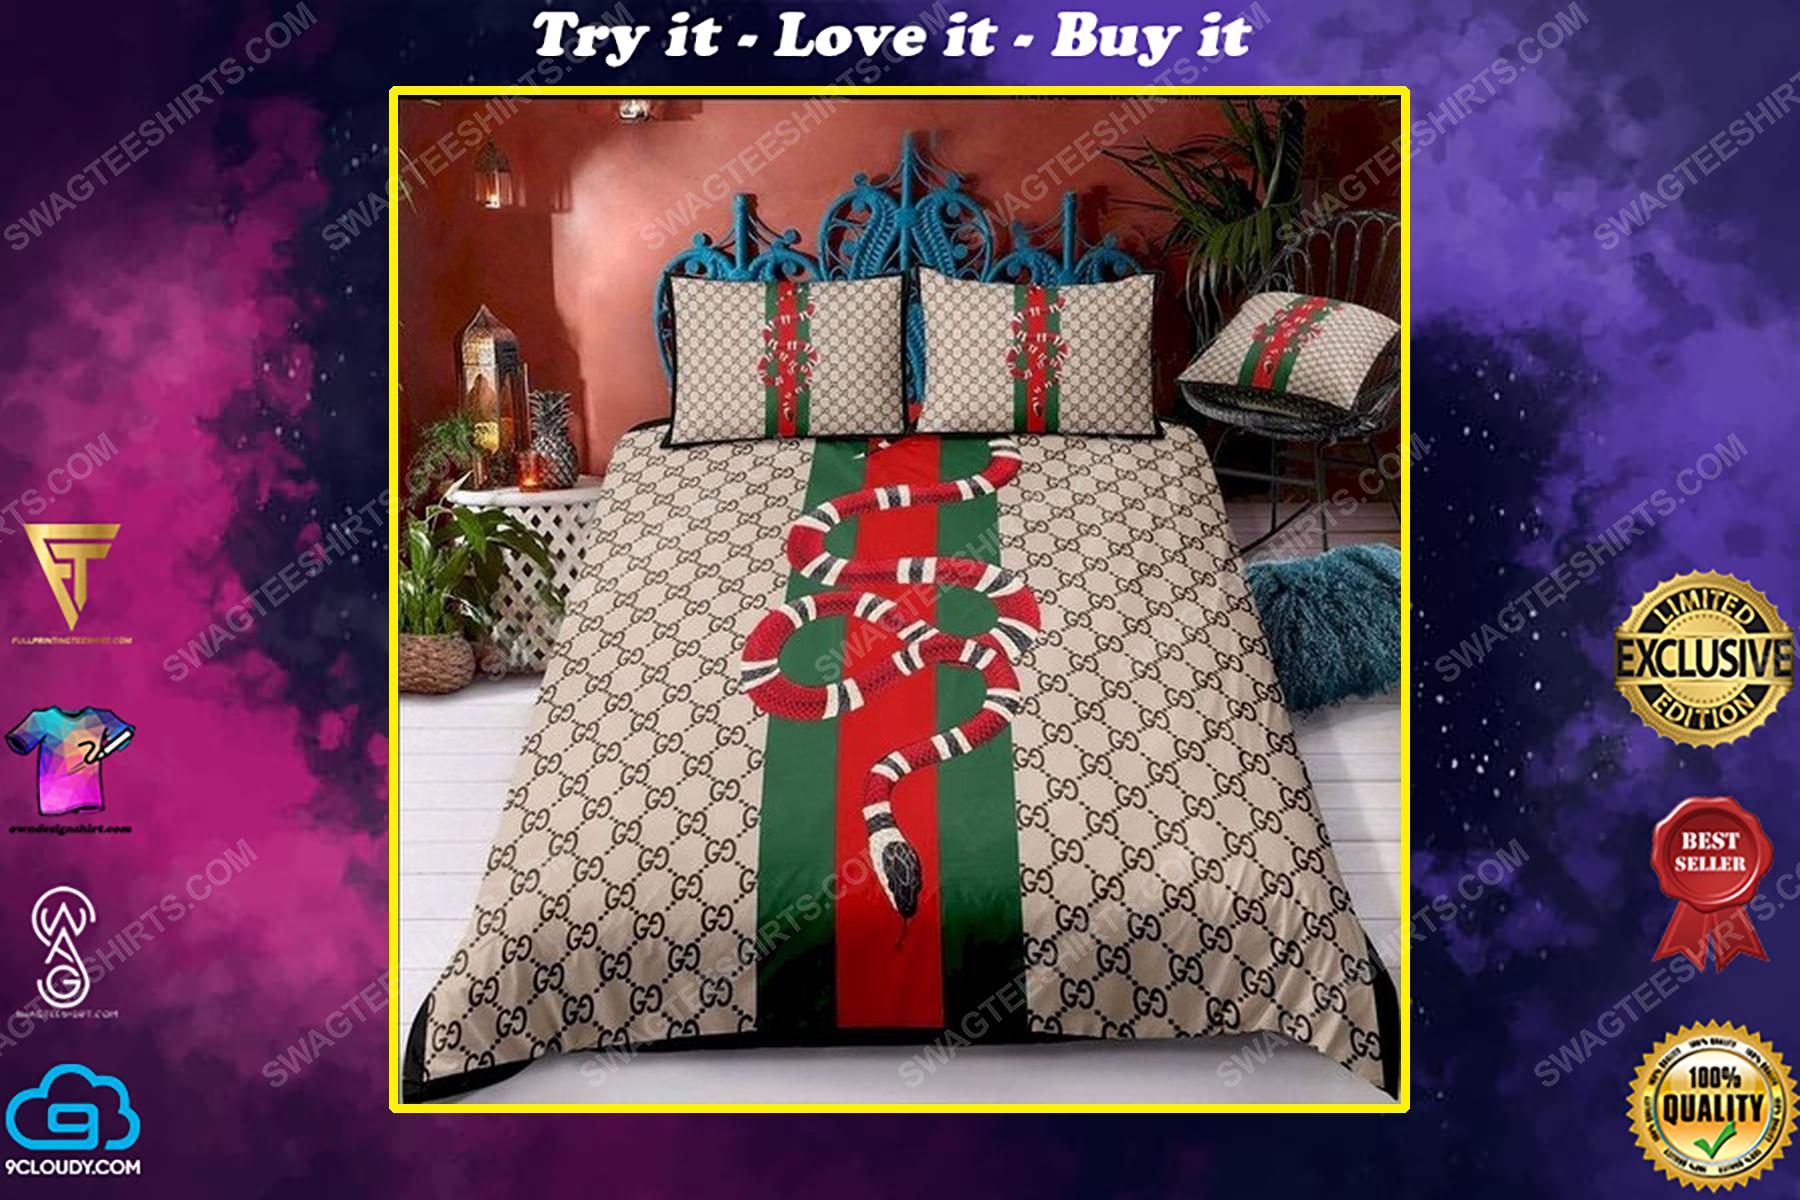 Gucci and snack symbols full print duvet cover bedding set